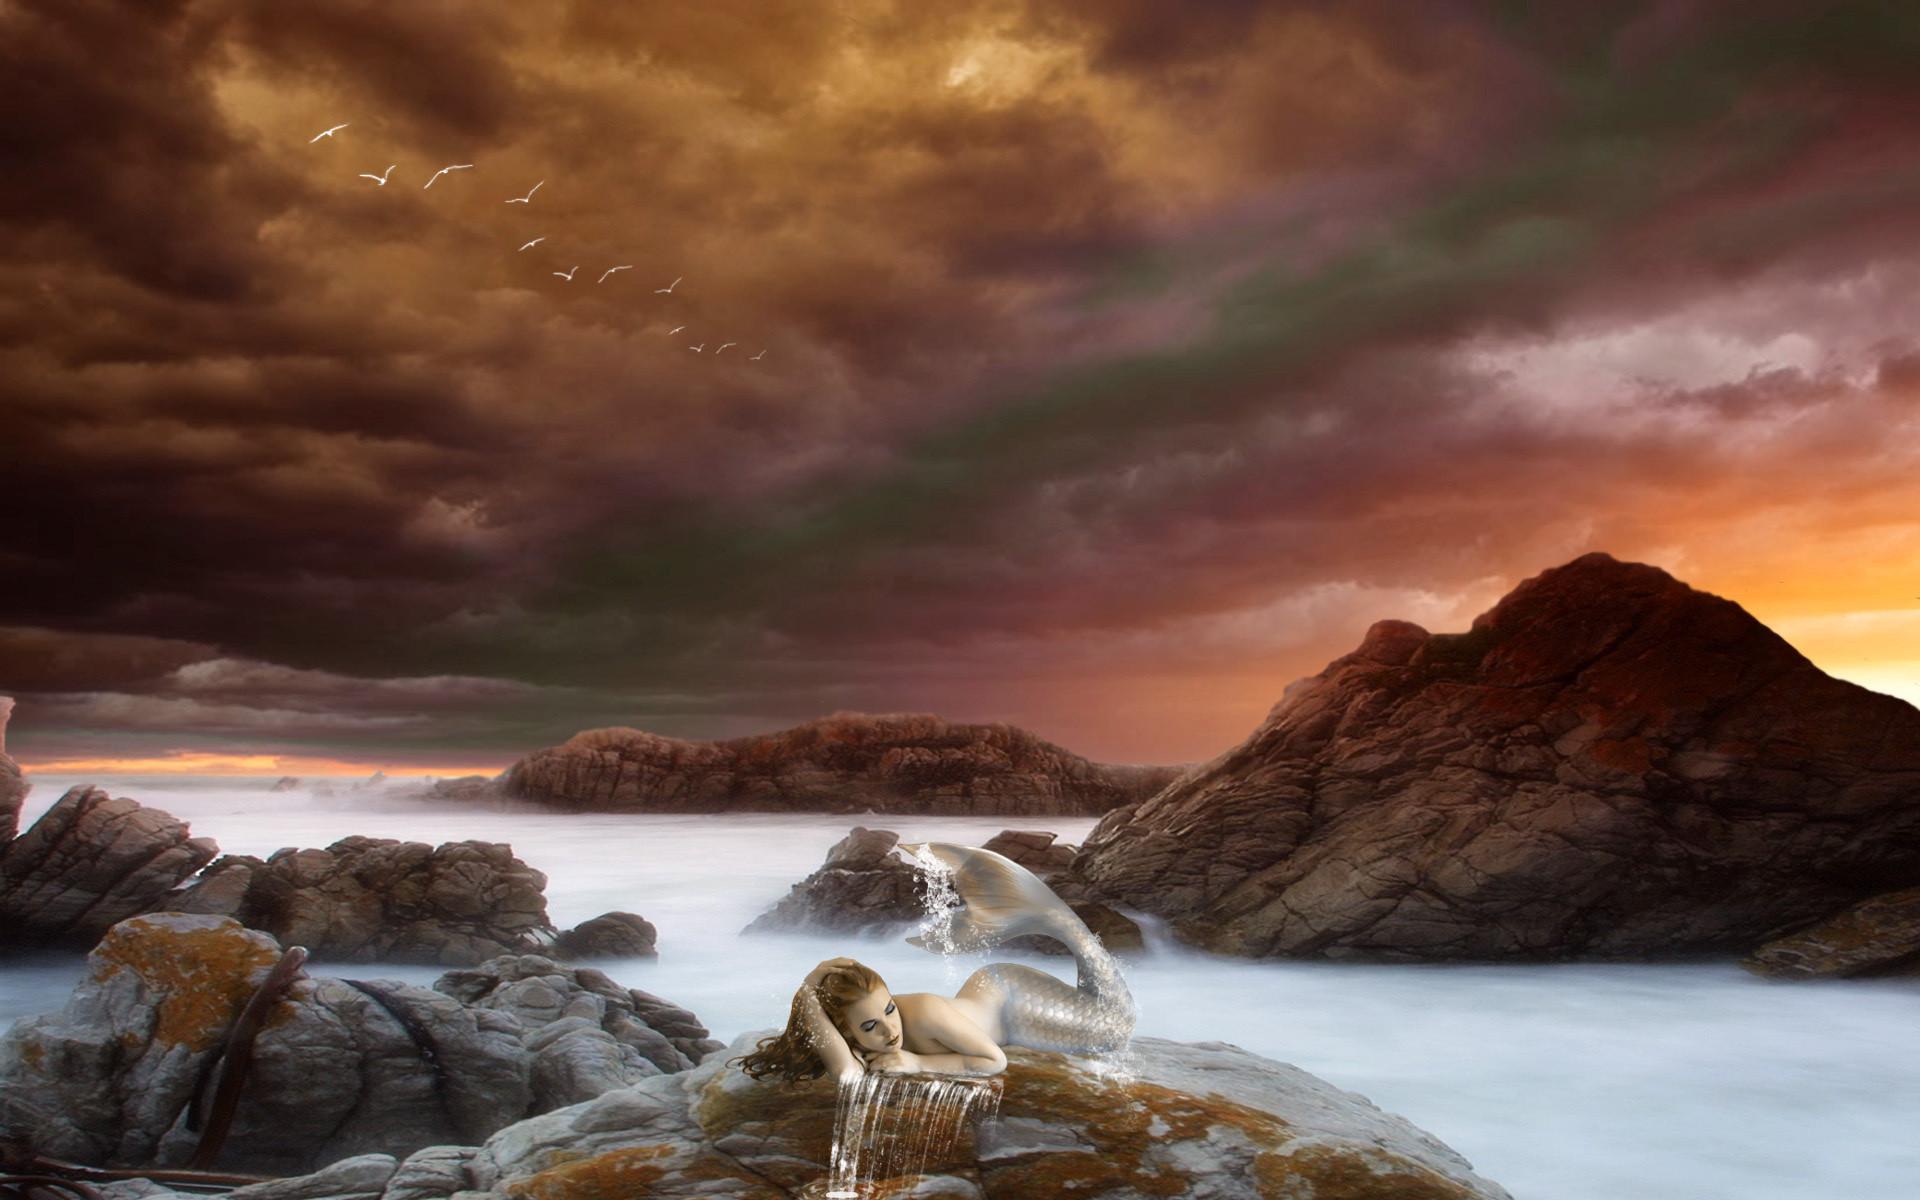 Fantasy – Mermaid Wallpaper